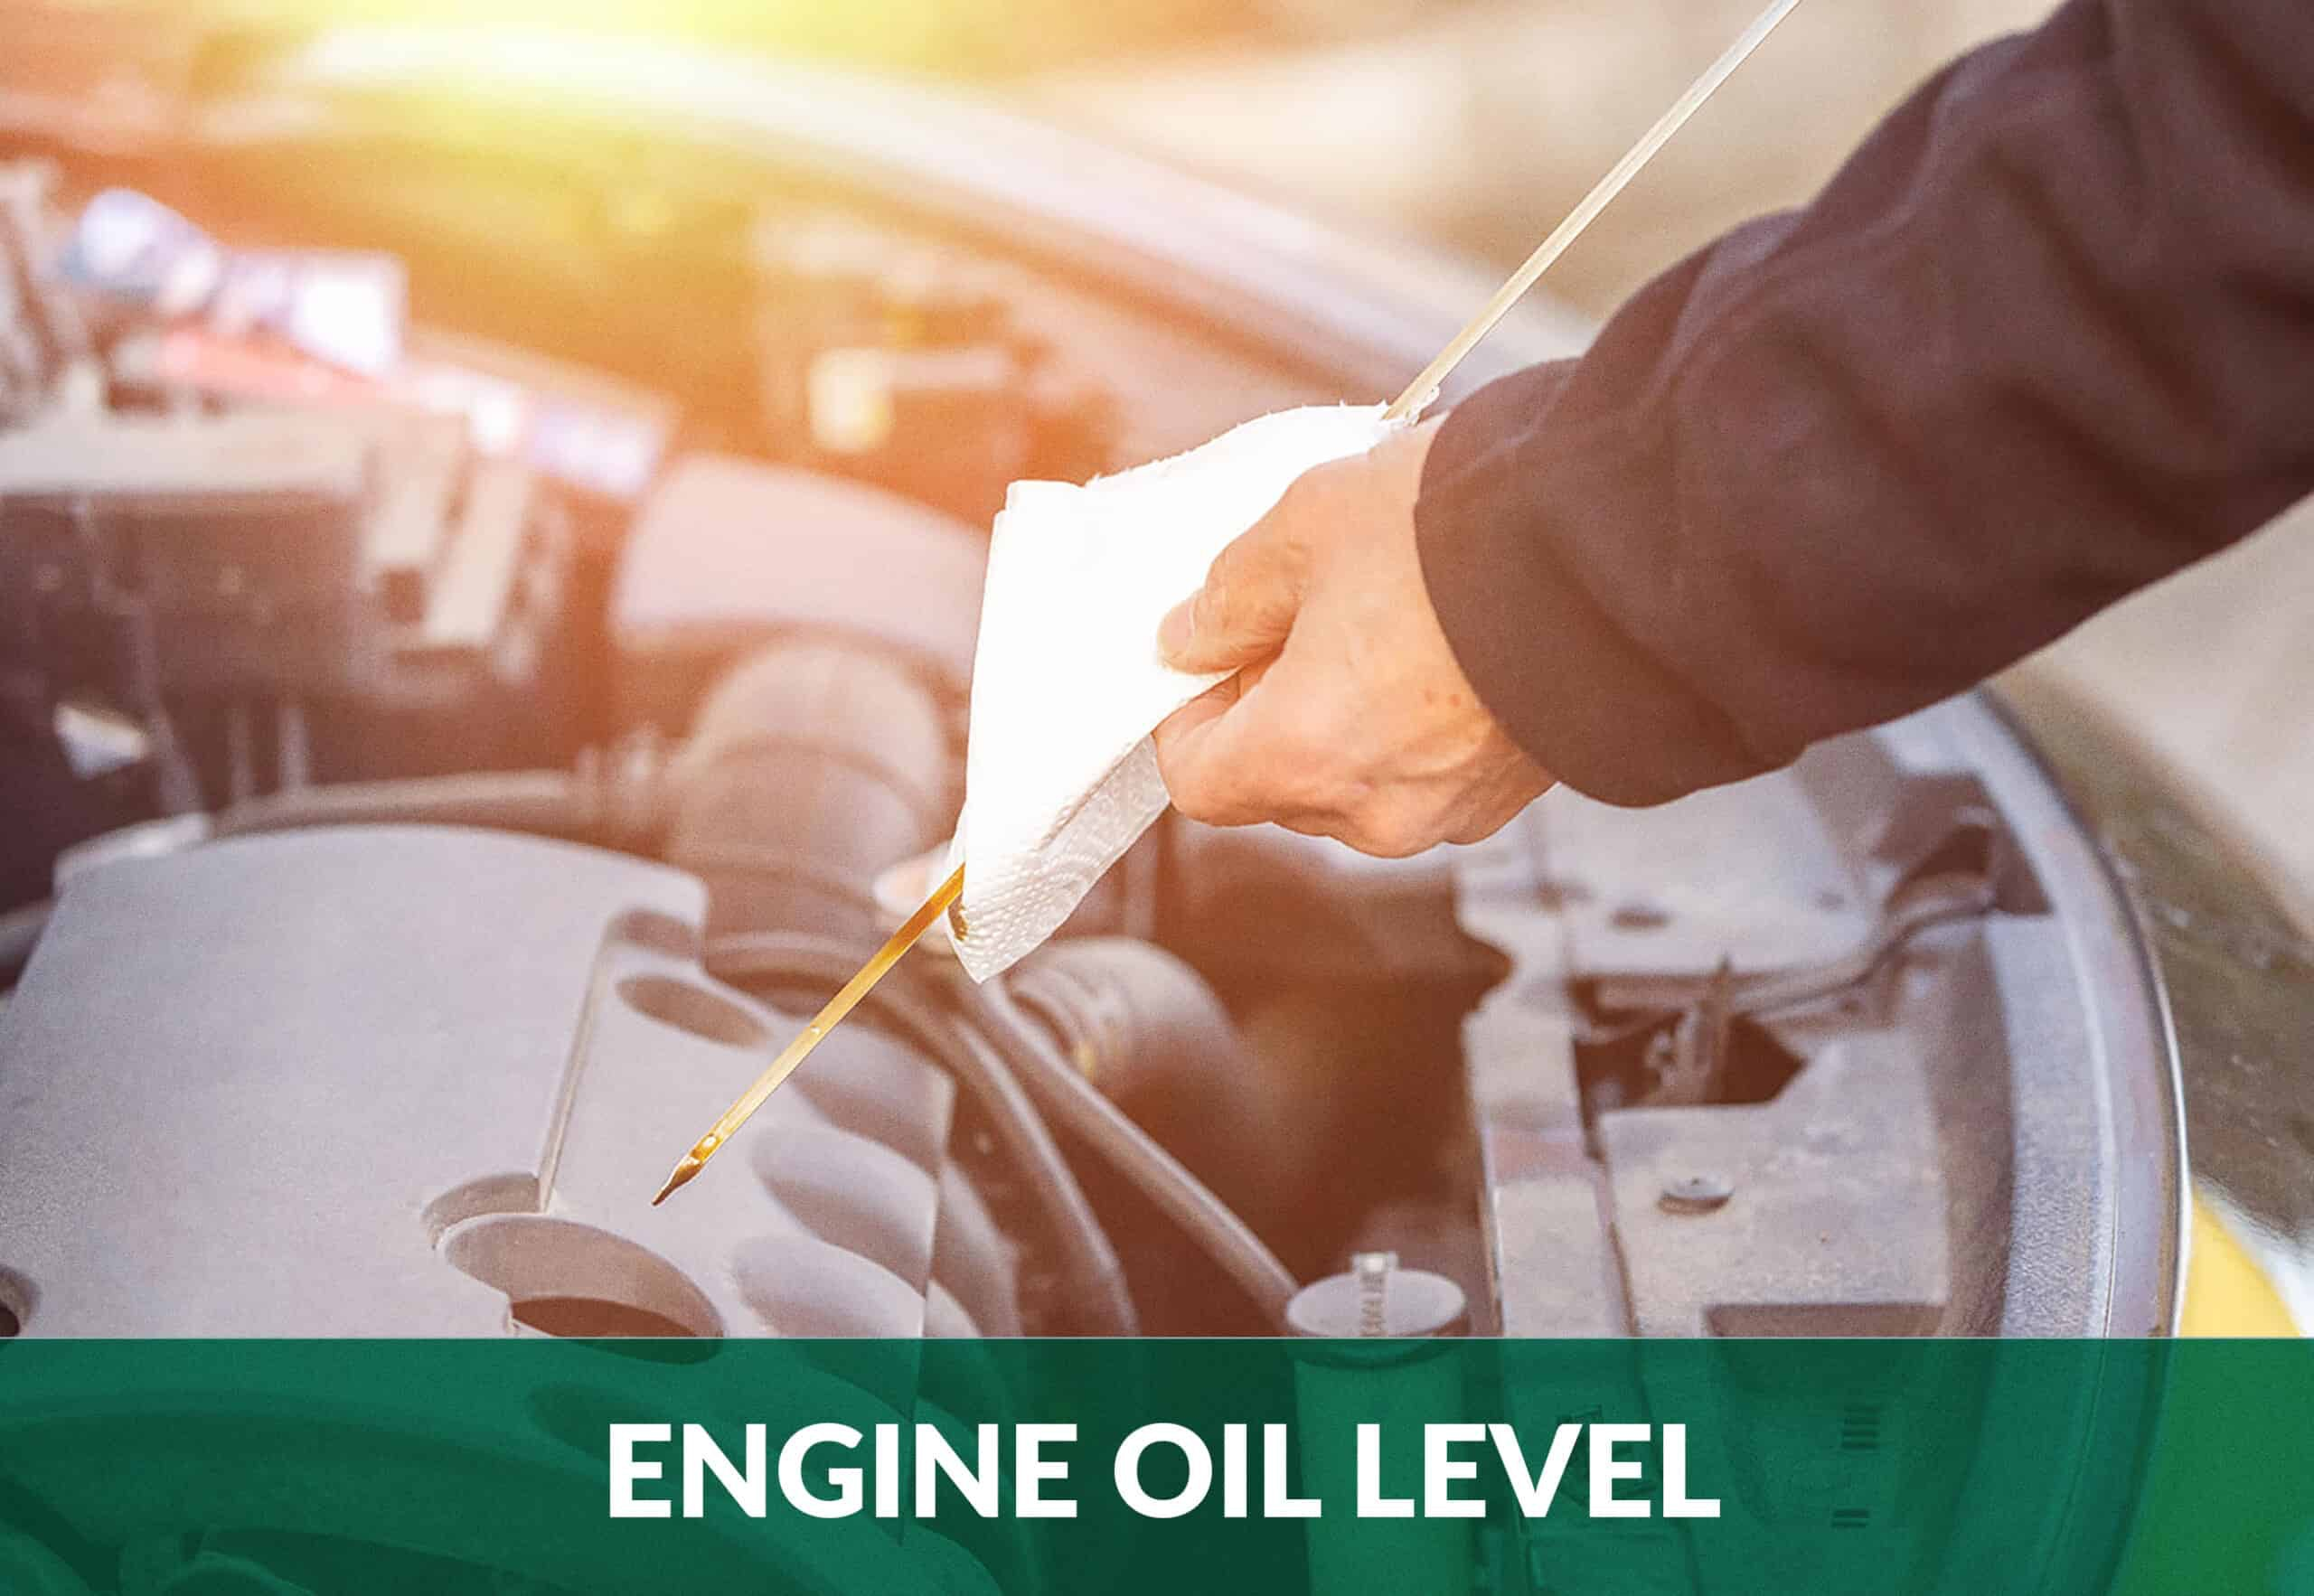 Engine oil level